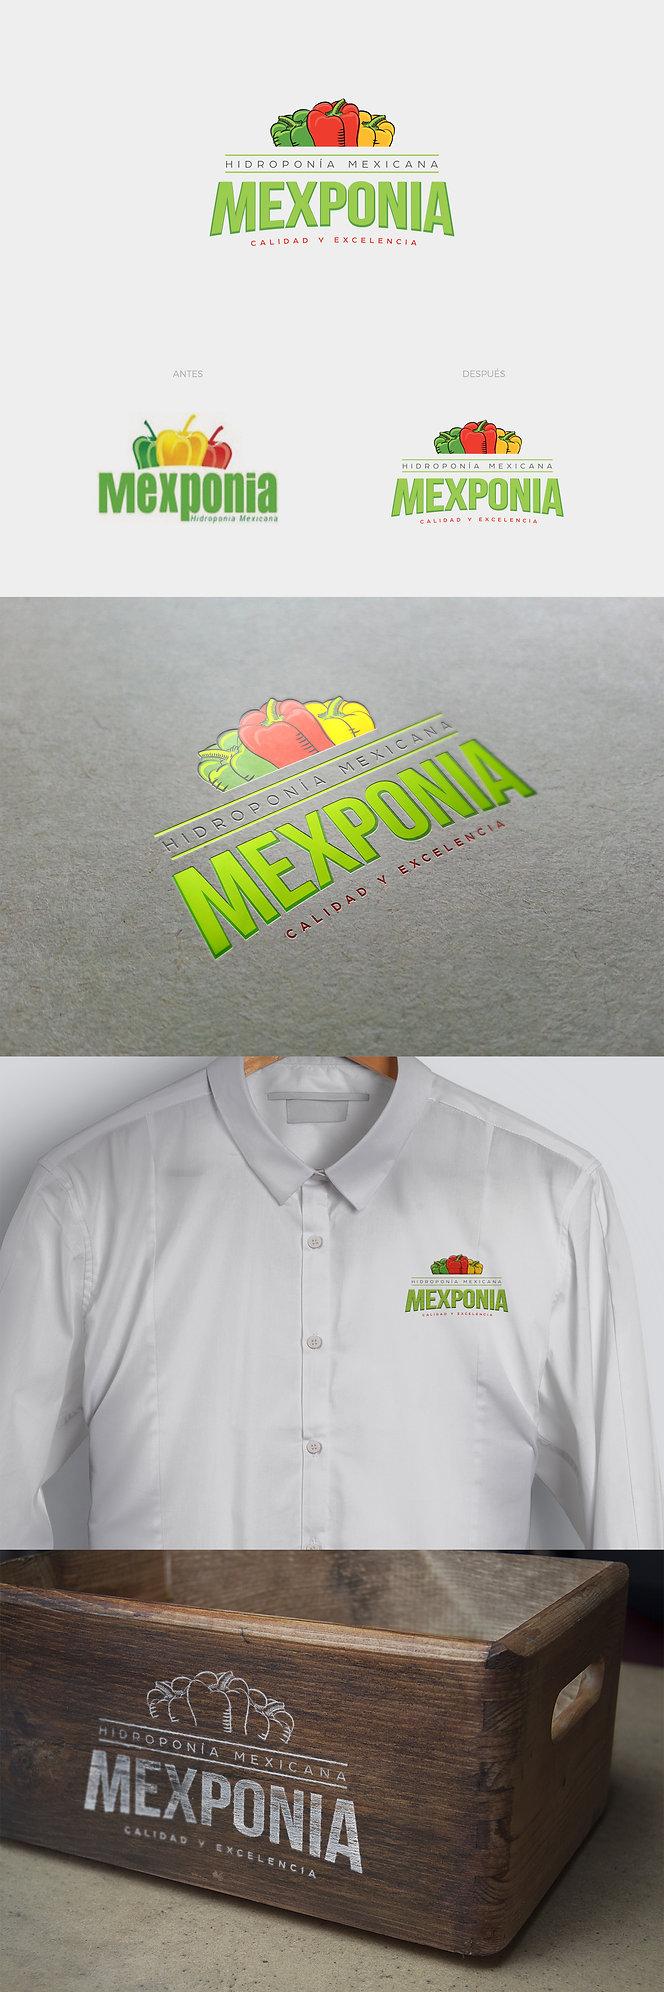 mexponia.jpg